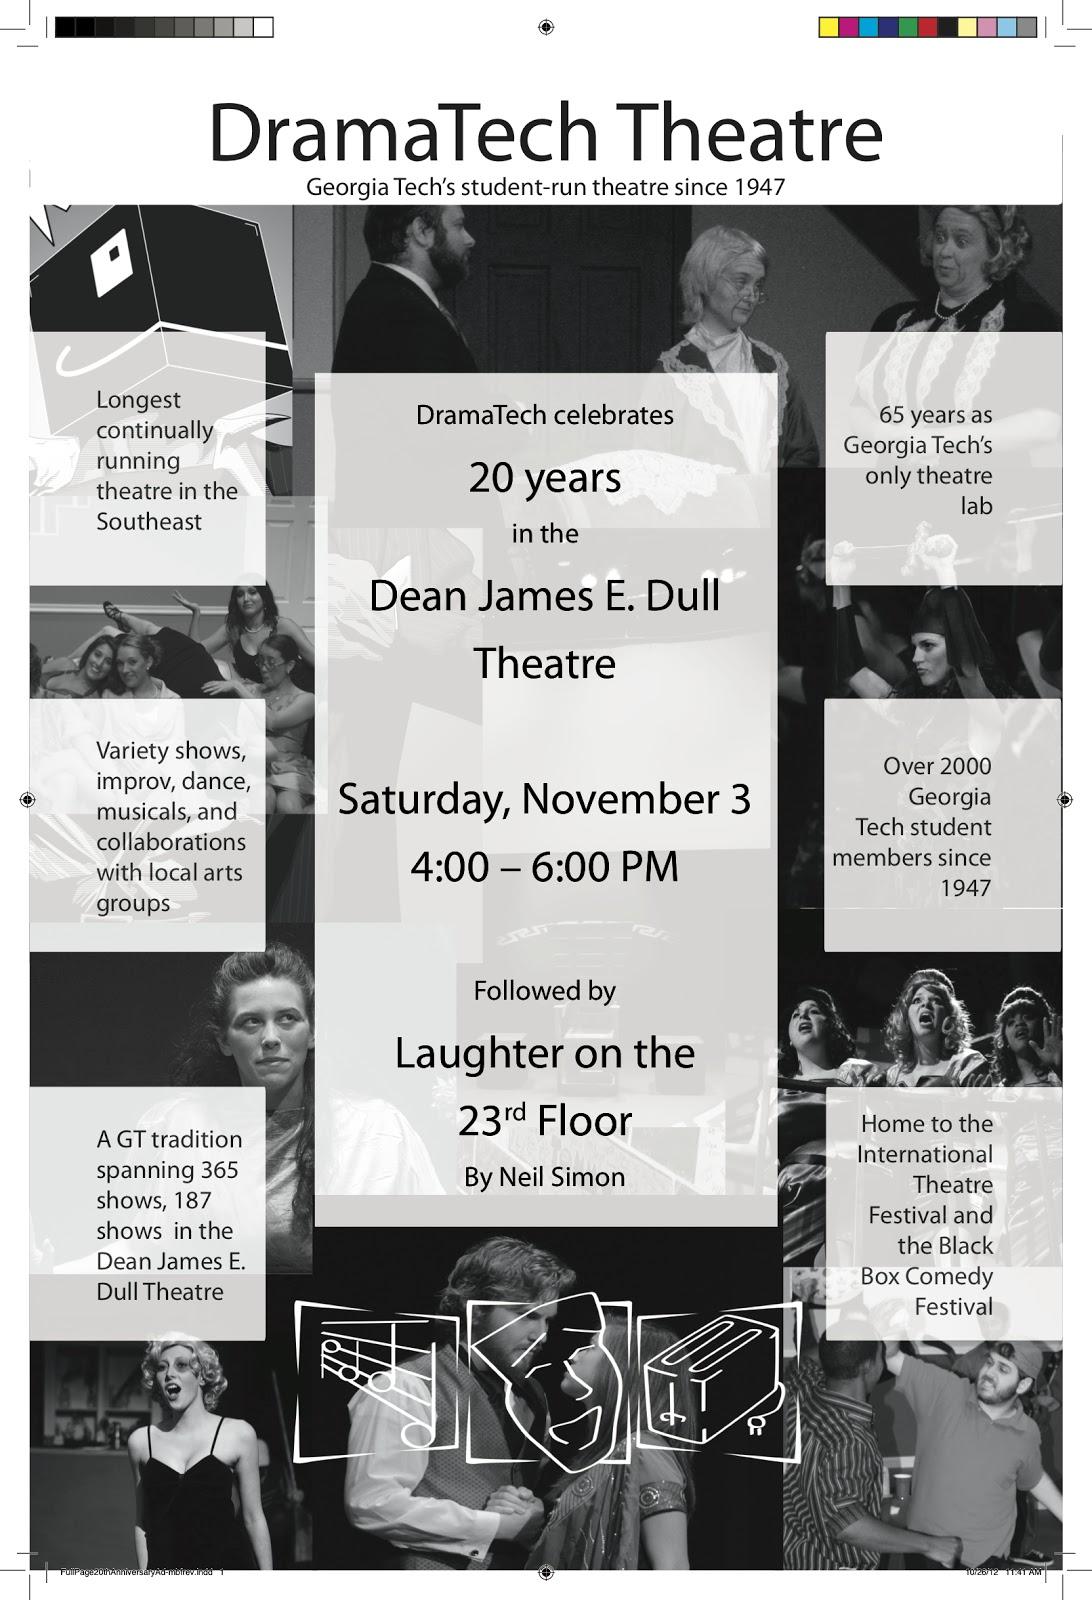 Dramatech Celebrates 20 Years In Dean James E Dull Theatre Lmc At Gatech